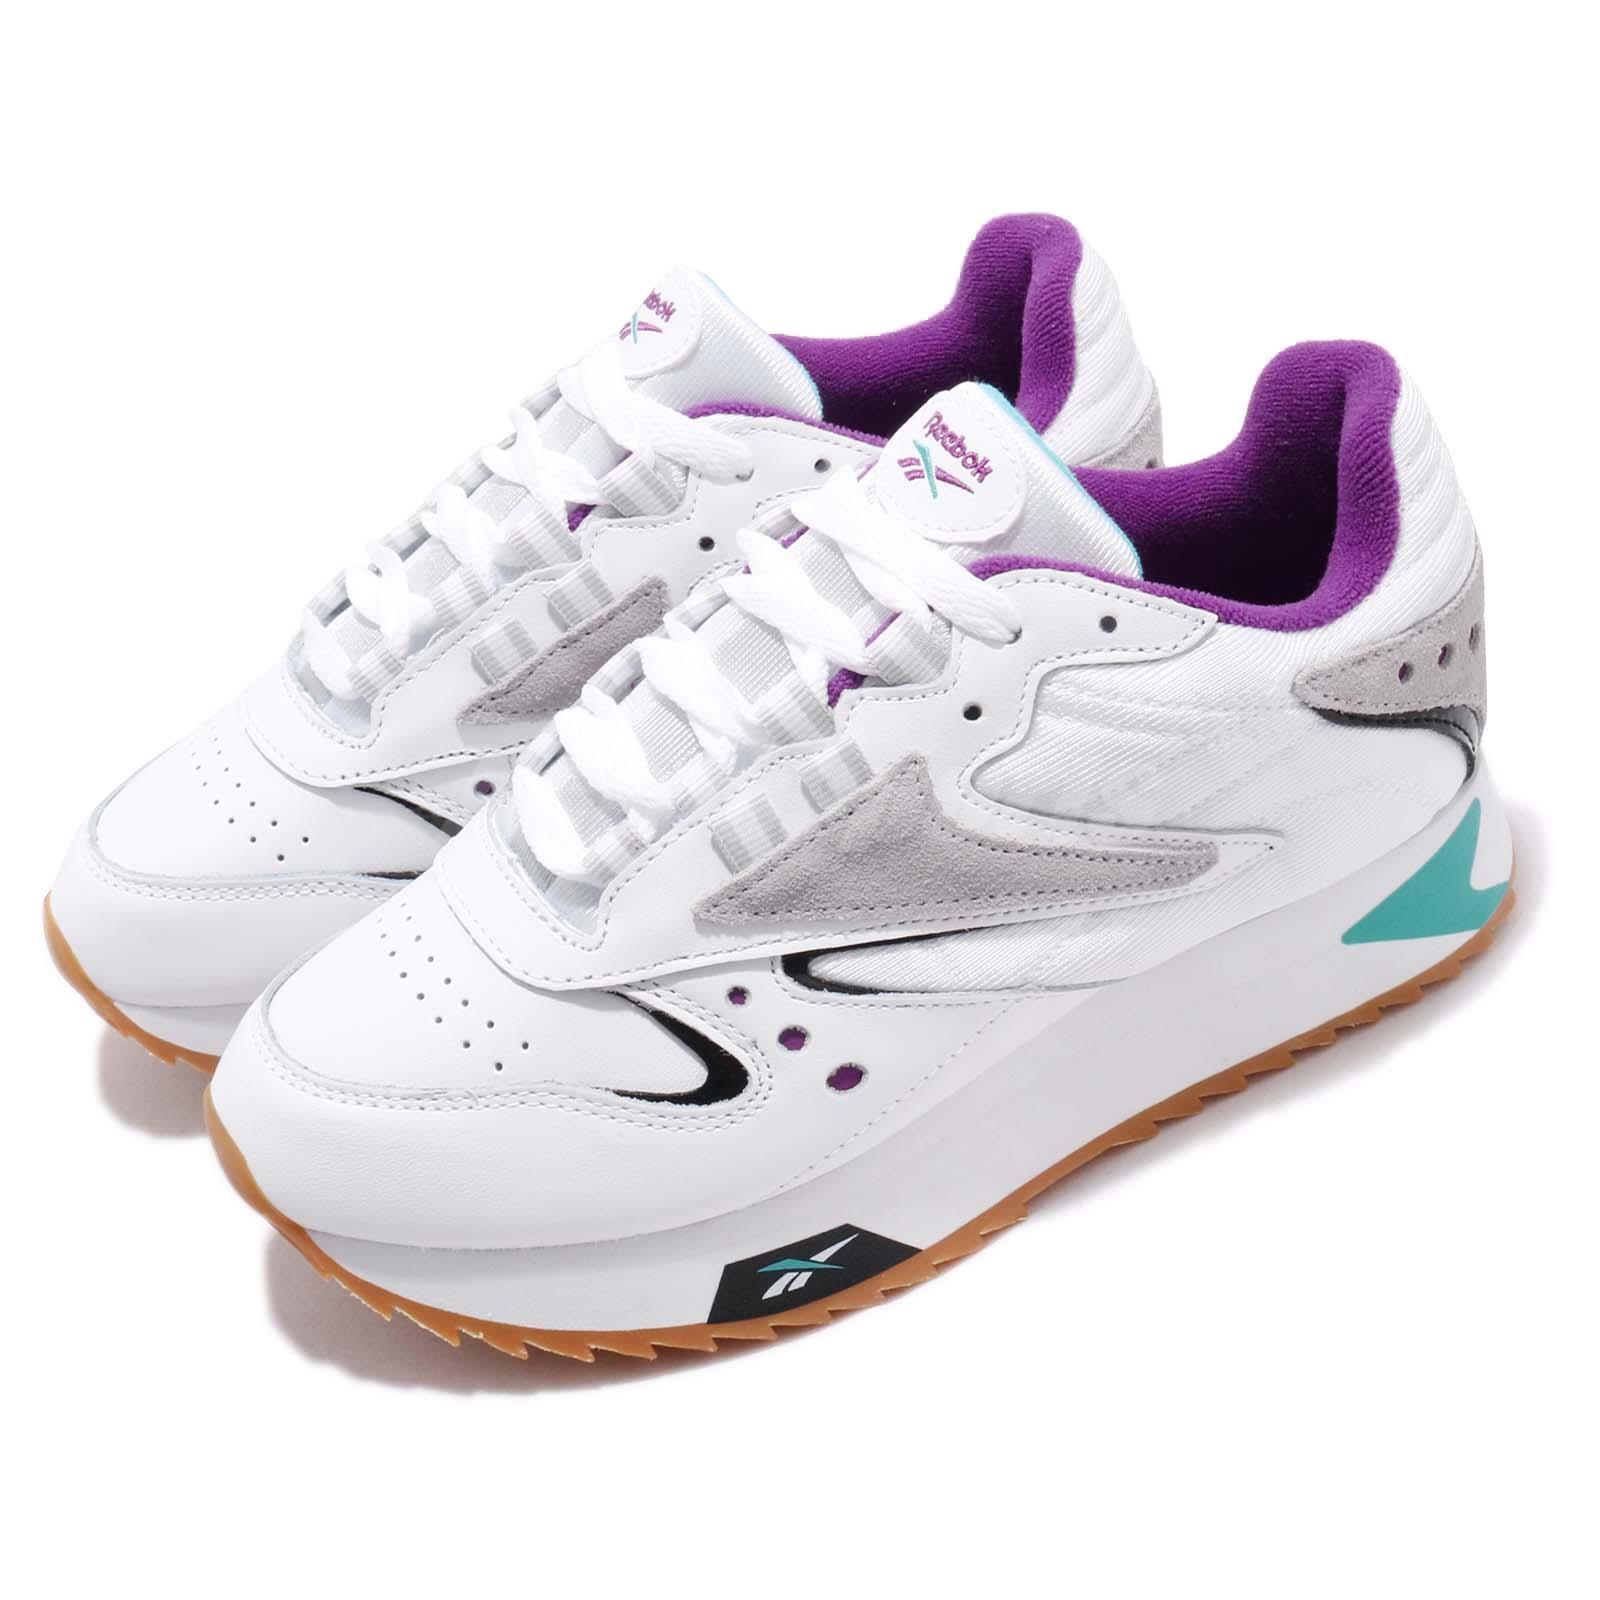 mejor lugar último clasificado comprar Reebok CL LTHR ATI 90s W White Teal Purple Womens Classic Shoes ...